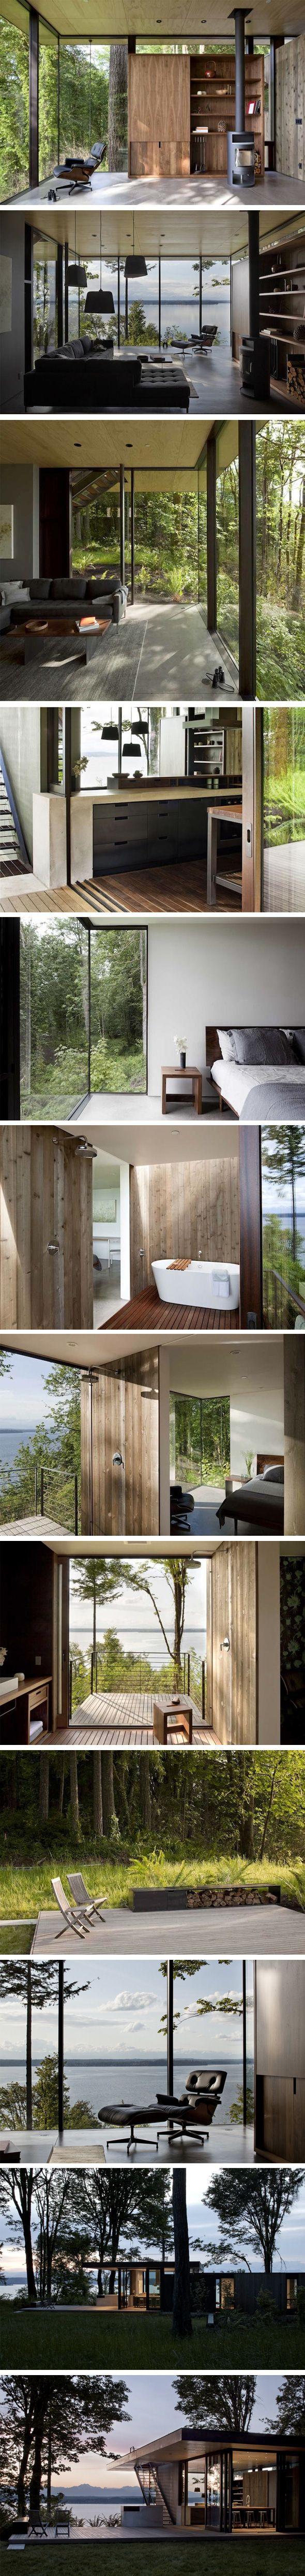 Case-Inlet-Retreat-MWWorks-Architecture+Design-2 Plus